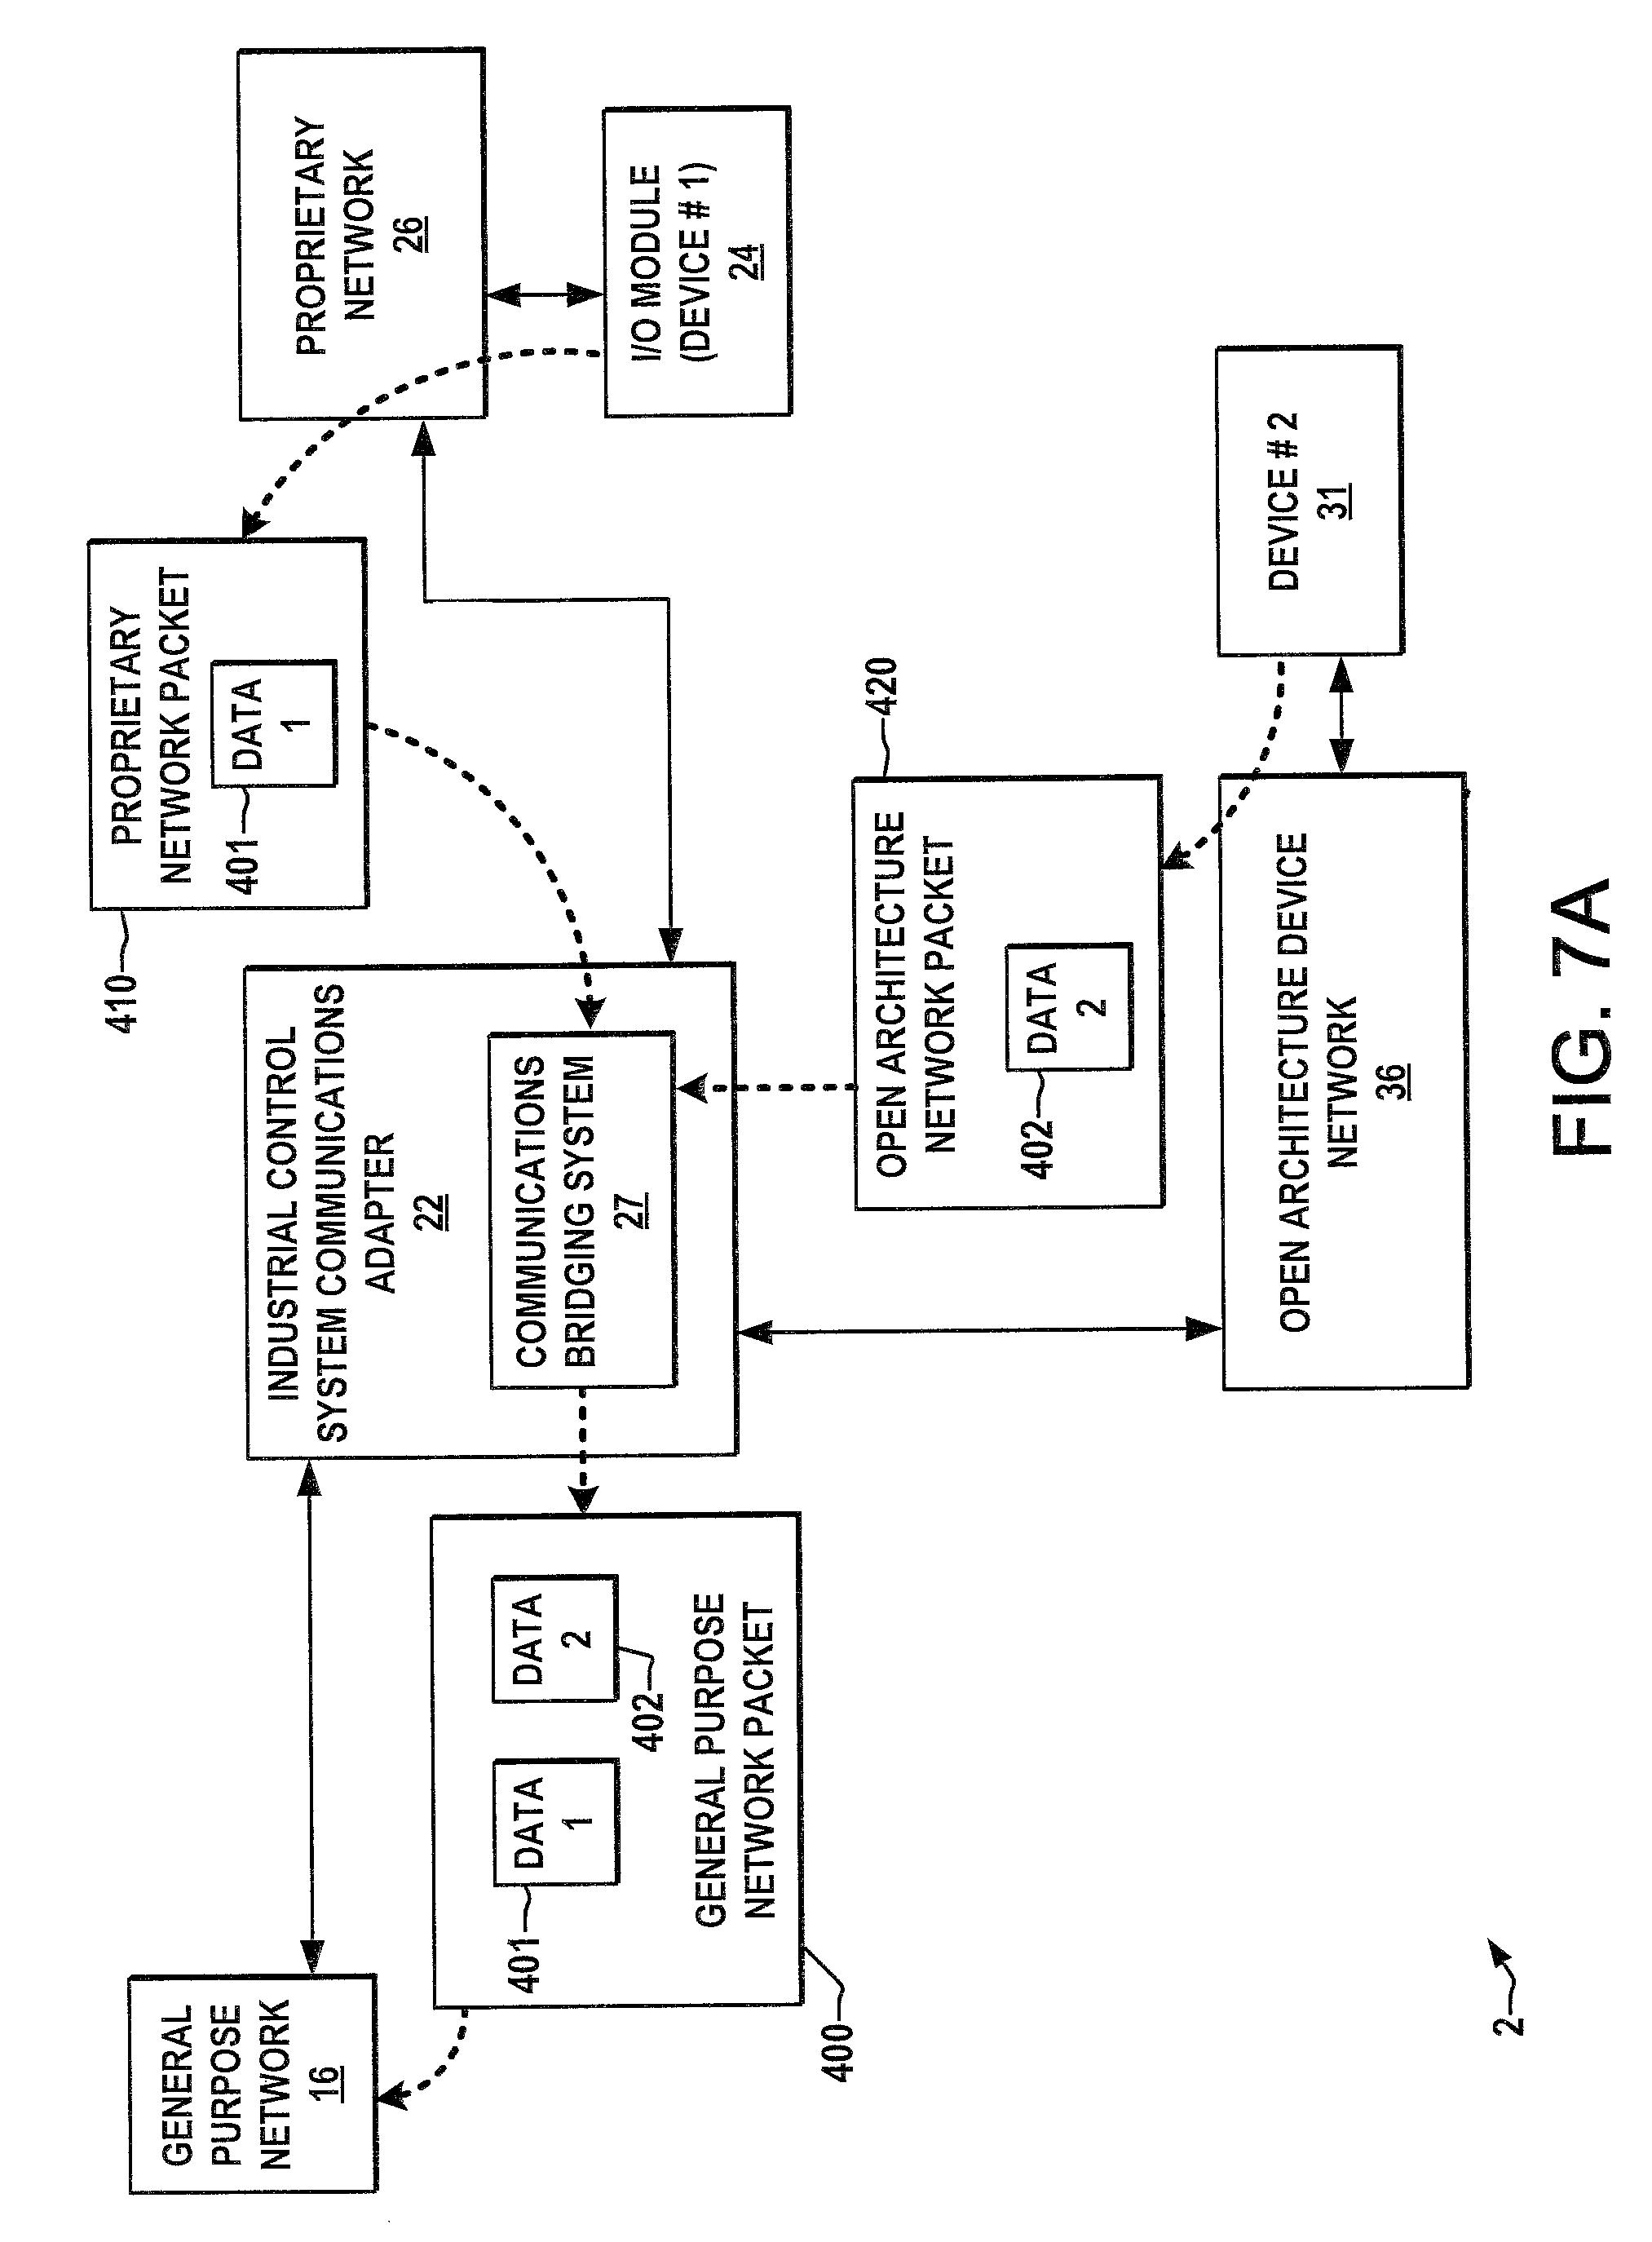 Industrial Ethernet Wiring Diagrams : 35 Wiring Diagram